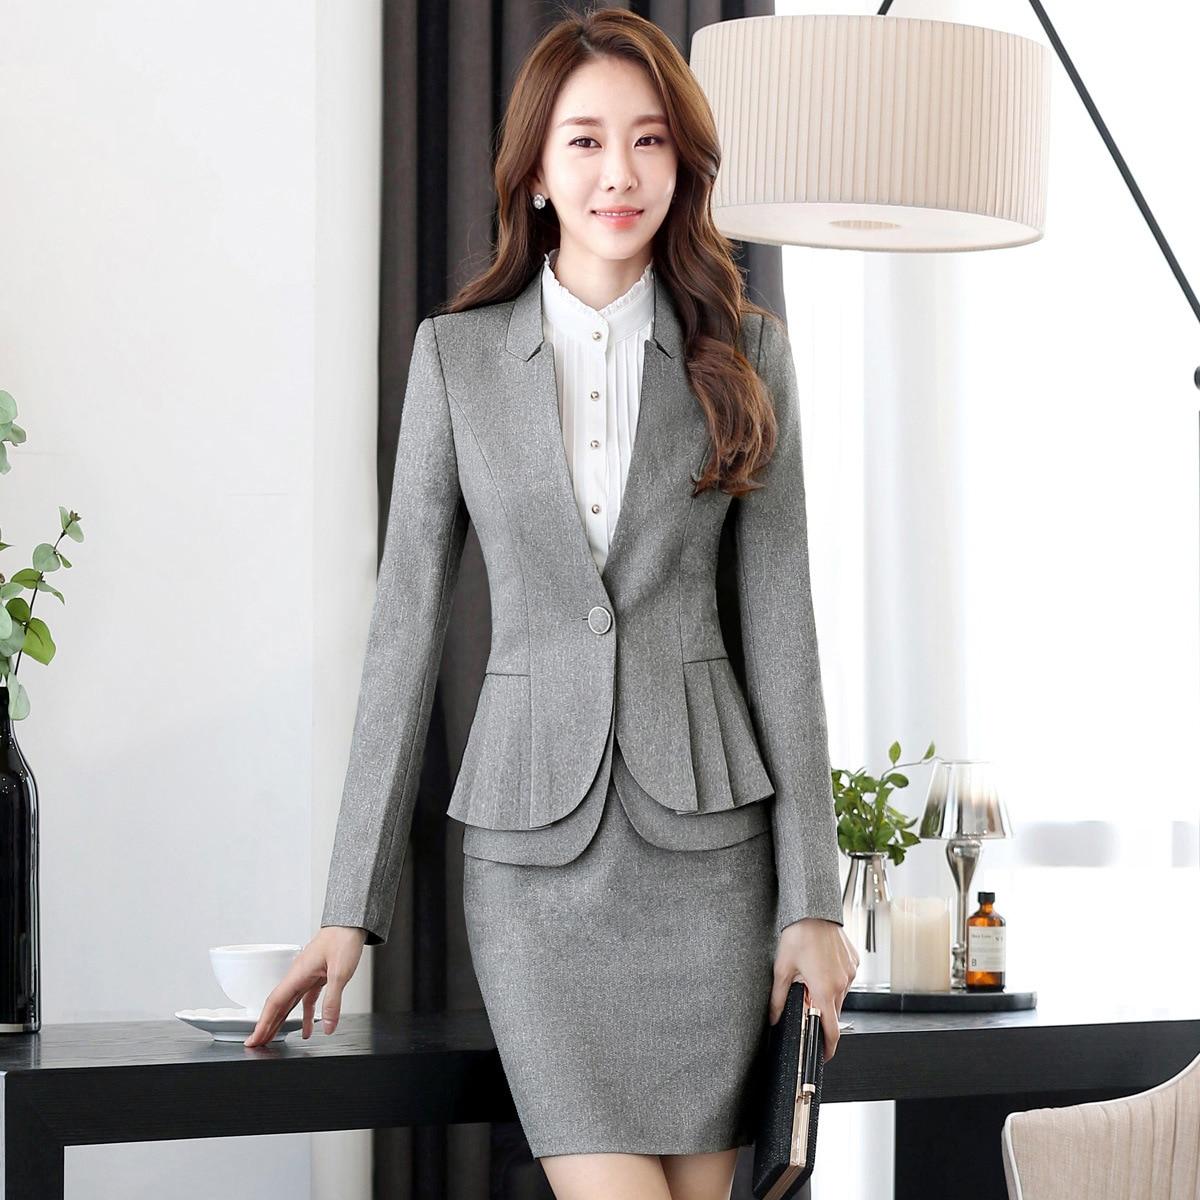 Professional Women Skirt Suits Blazers Autumn Business Ladies Office Work Wear White collar (jacket/Skirt /shirt / pants)